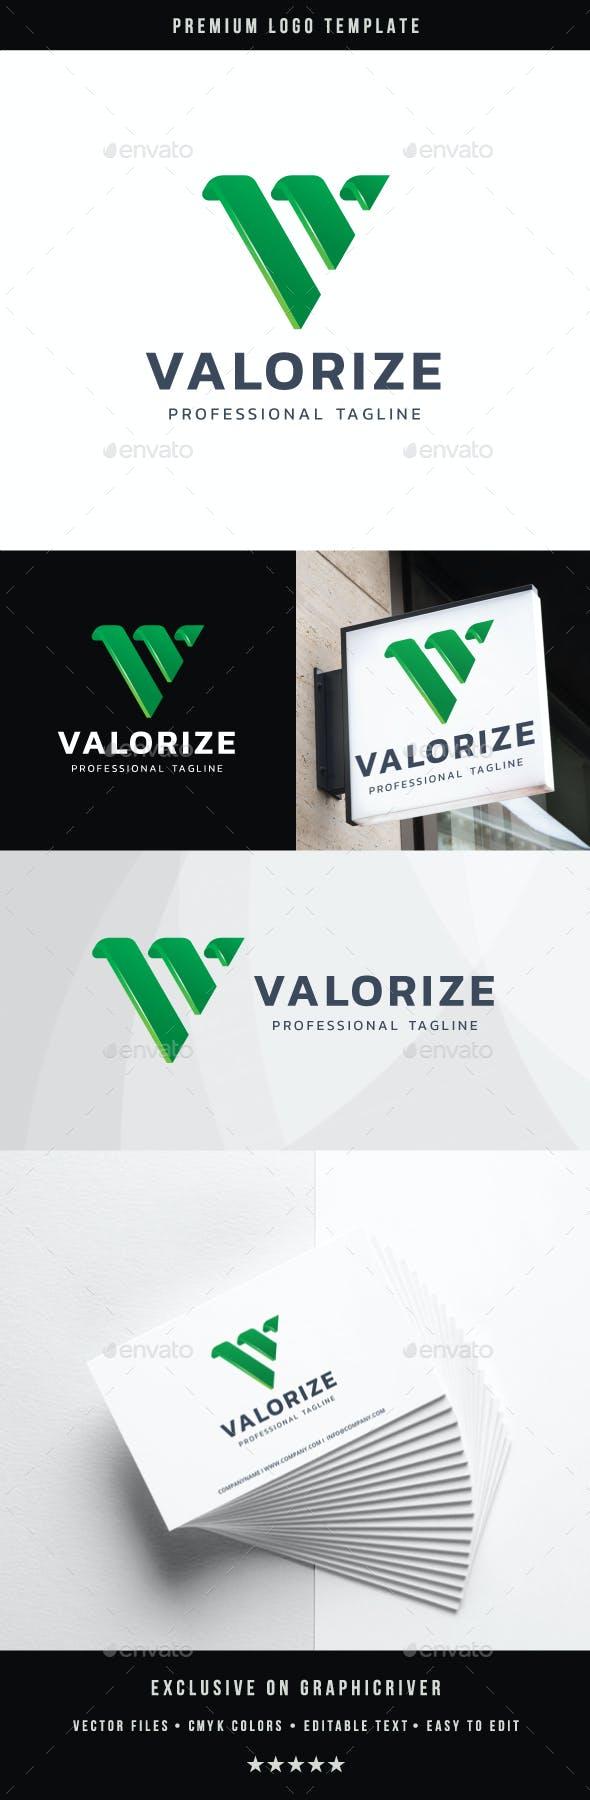 Letter V - Valorize Logo